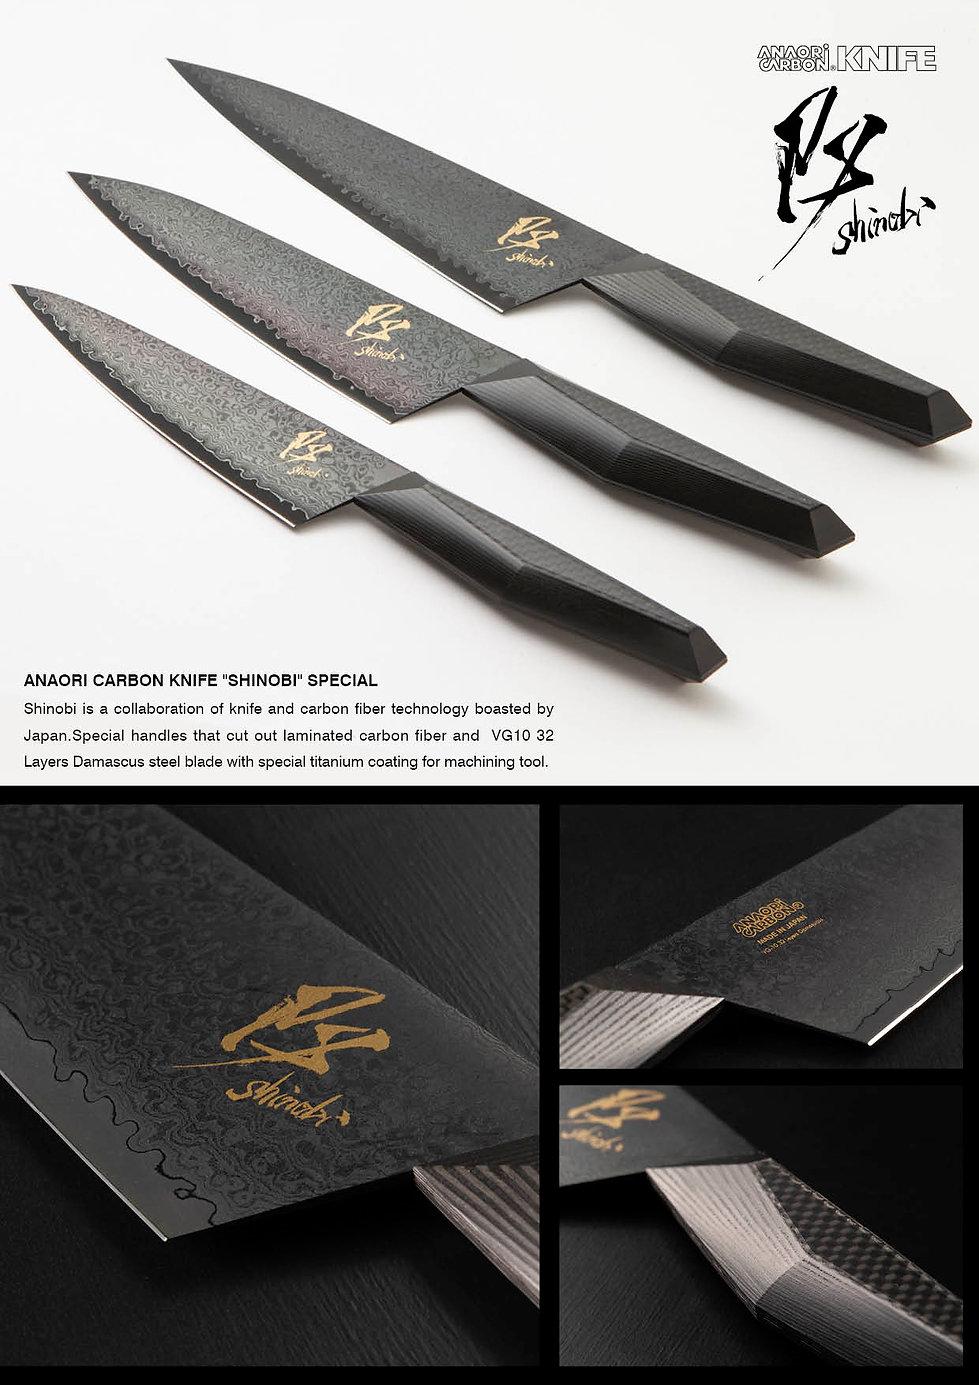 ANAORI CARBON KNIVES SHINOBI.jpg